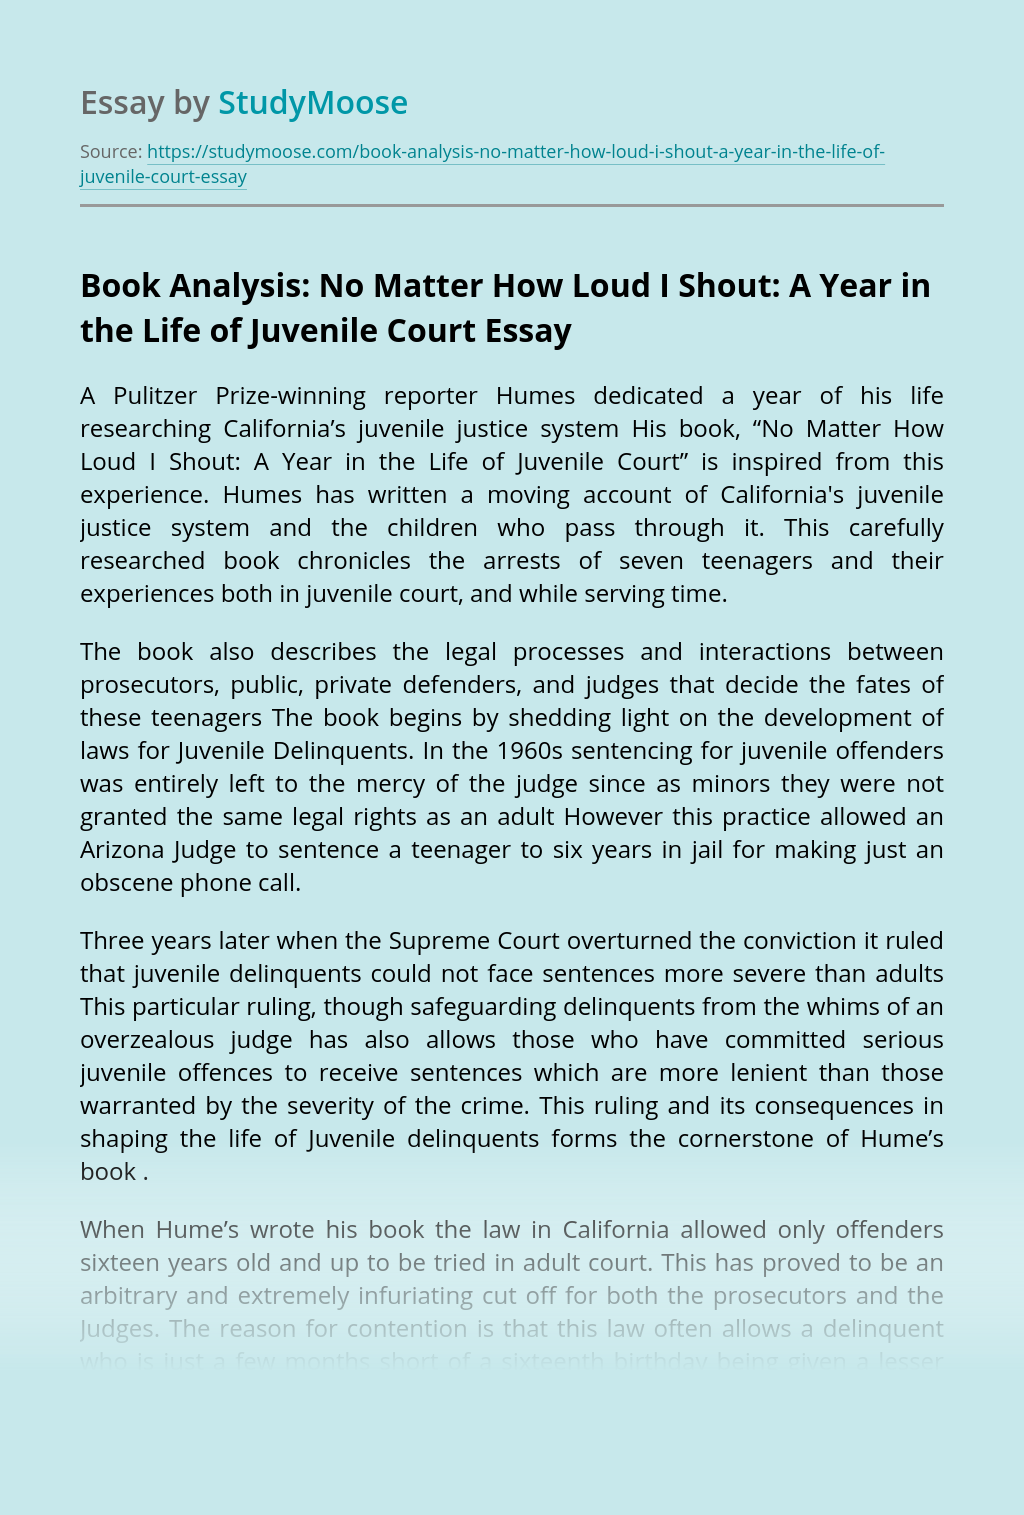 Process analysis essay peer review